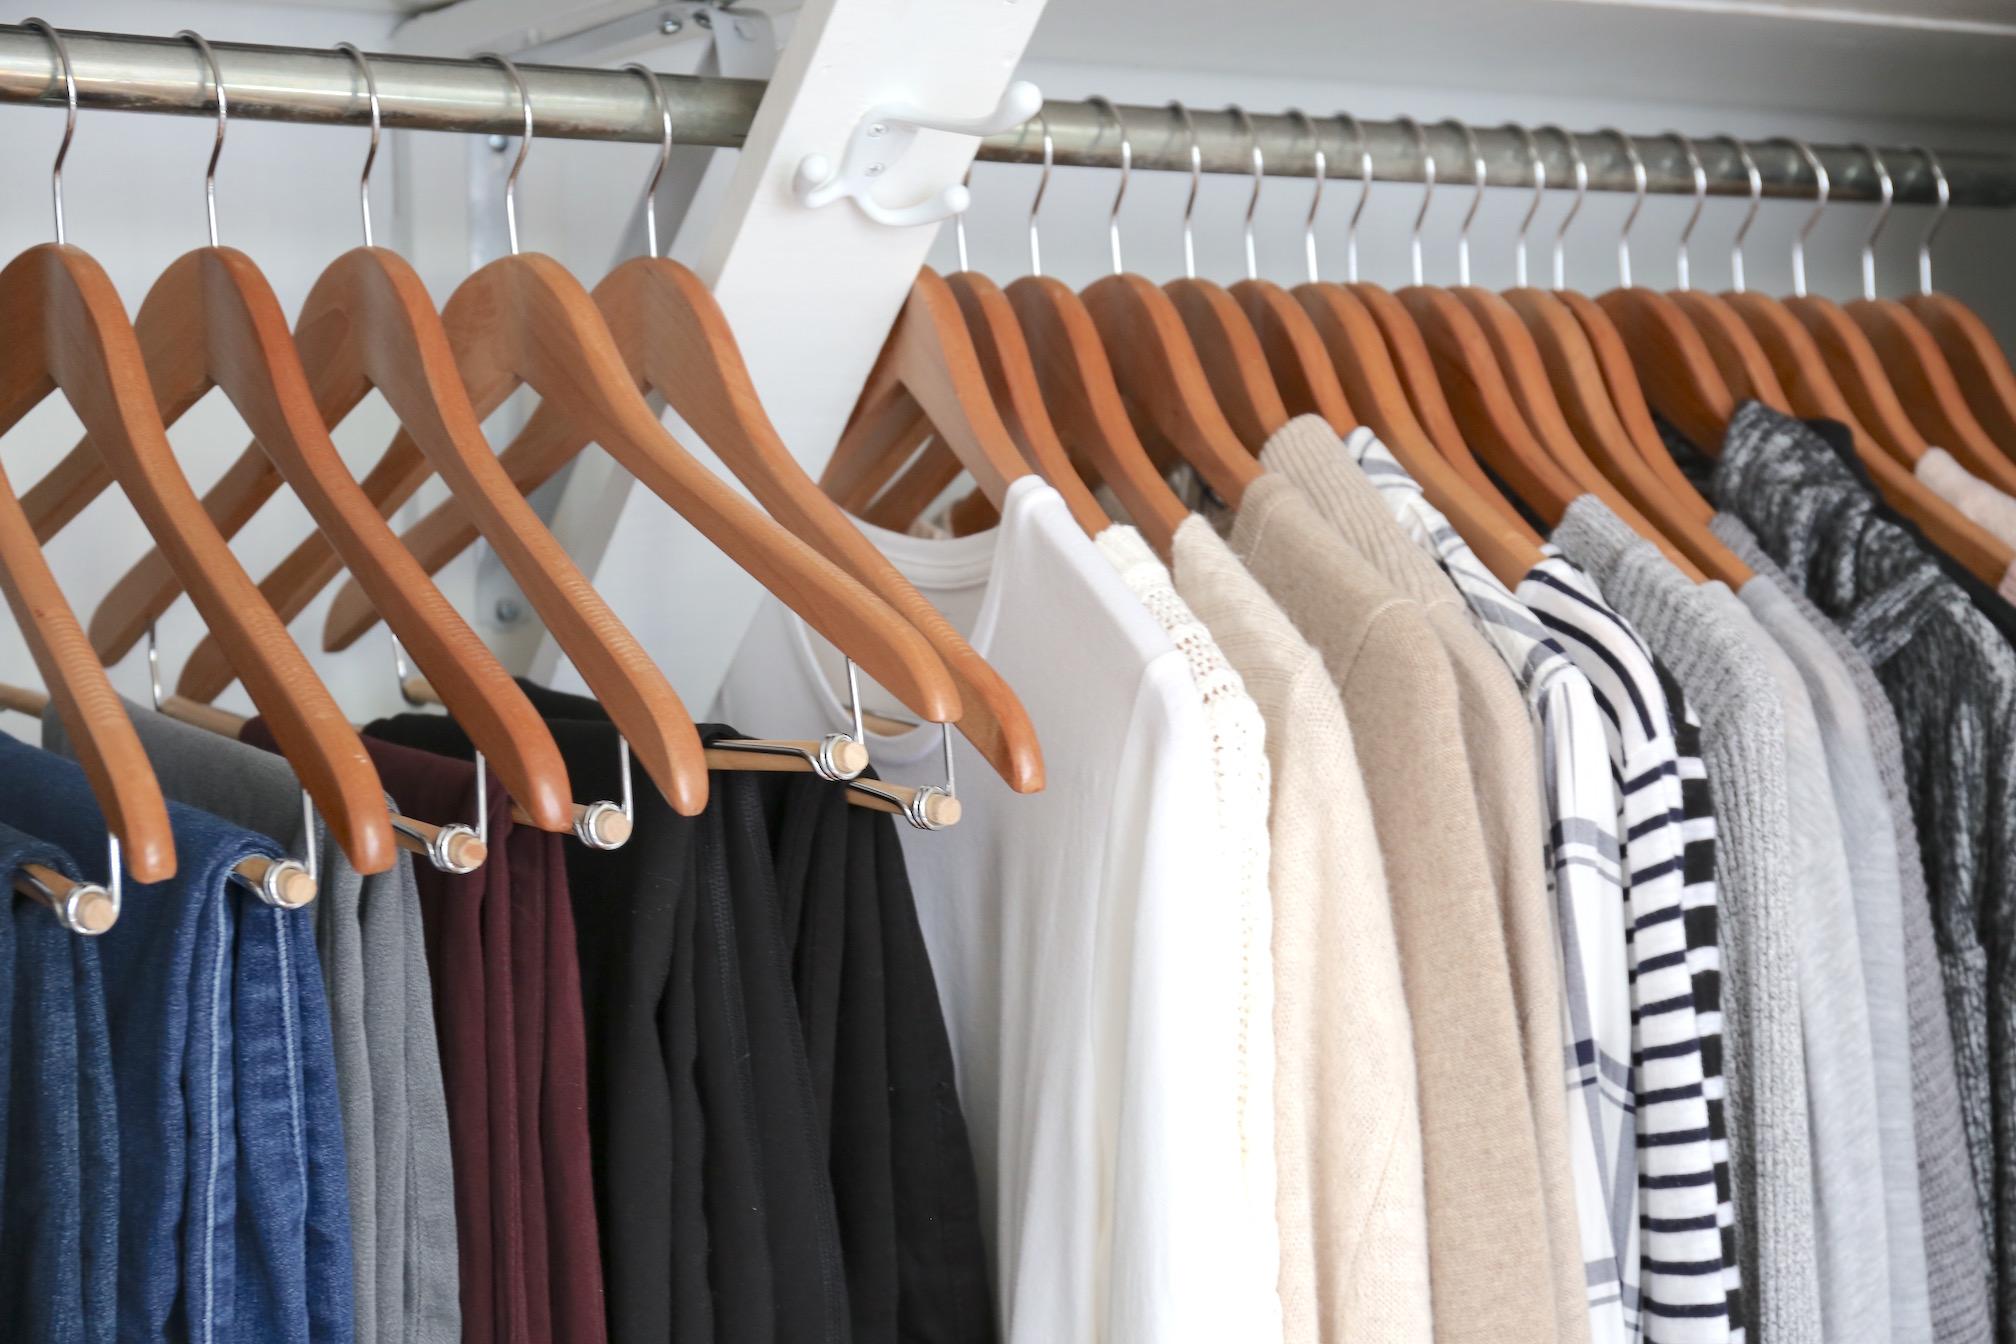 Winter 2017 Capsule Wardrobe - Full Side